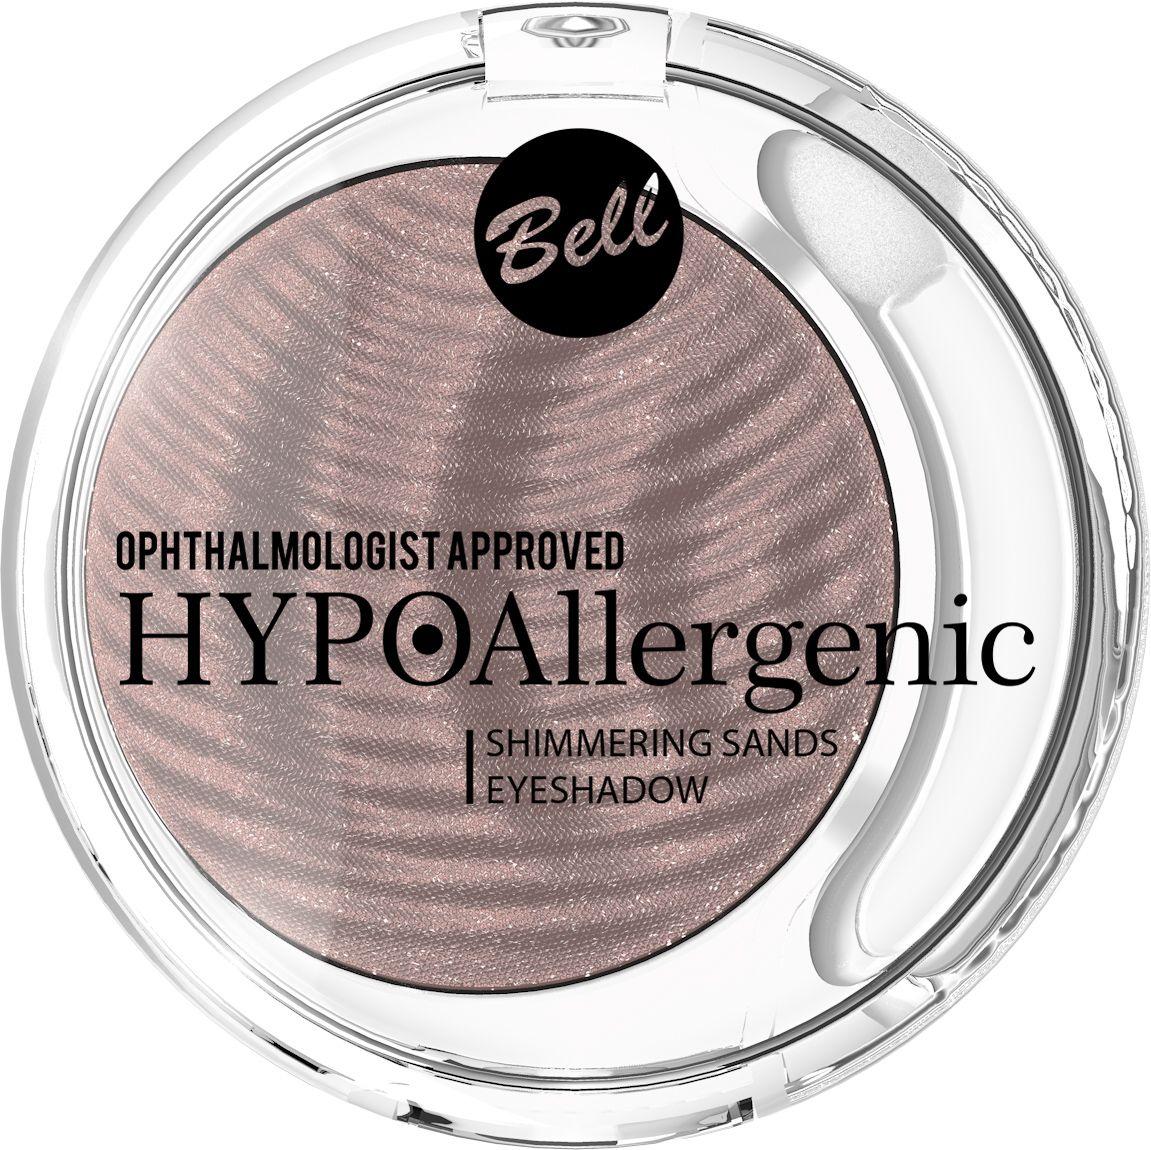 Bell Hypoallergenic Кремовые тени для век Shimmering Sands Eyeshadow, Тон №03BcssHA003